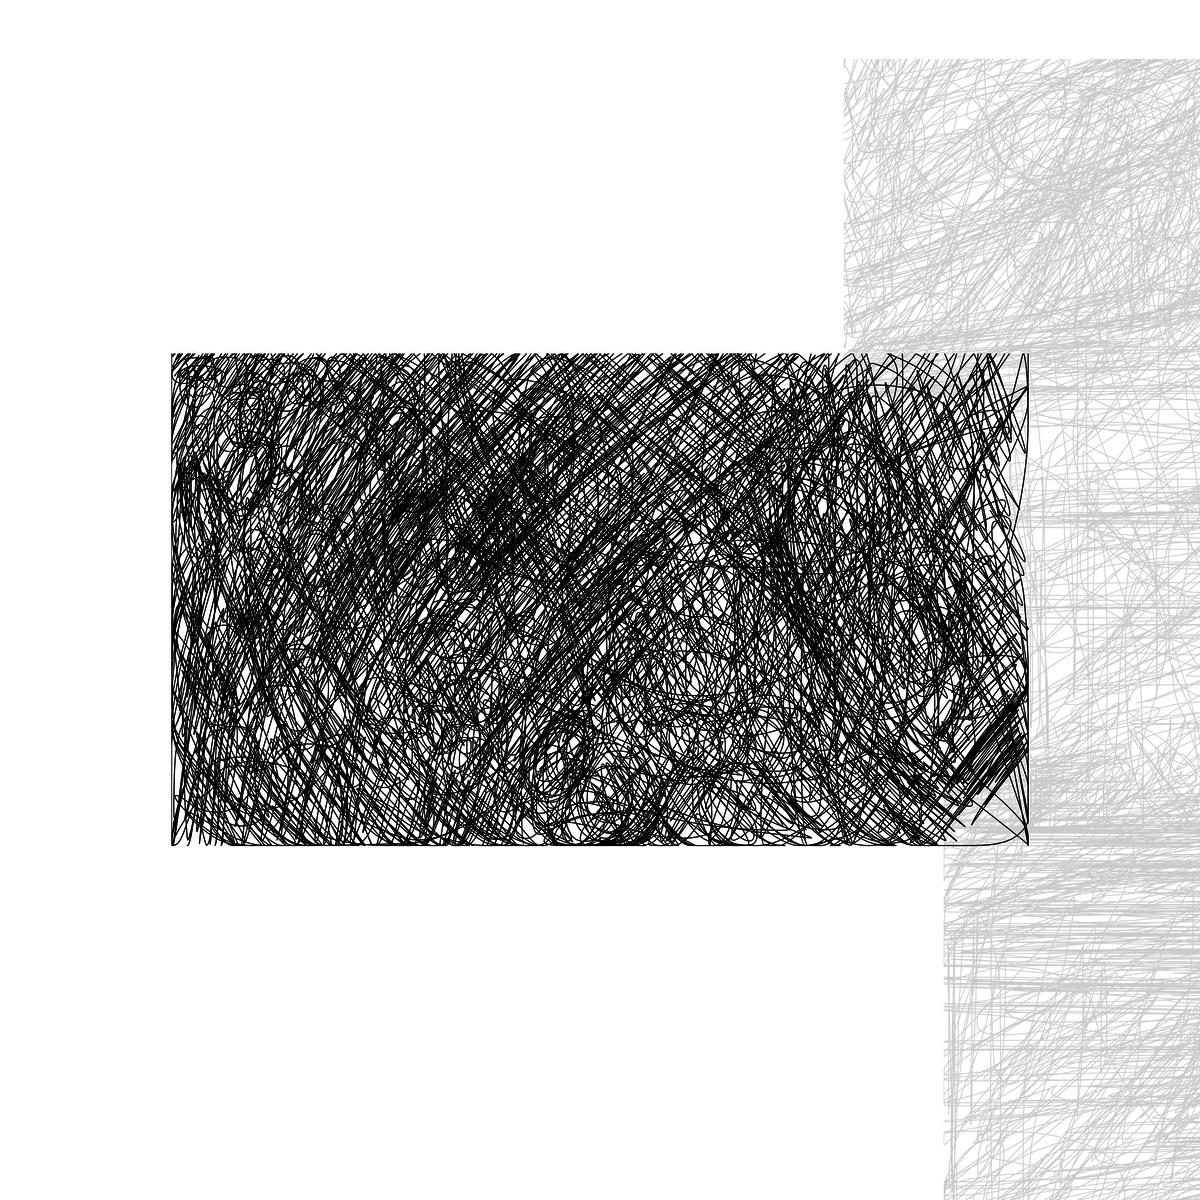 BAAAM drawing#23383 lat:46.5209236145019500lng: 6.6337280273437500